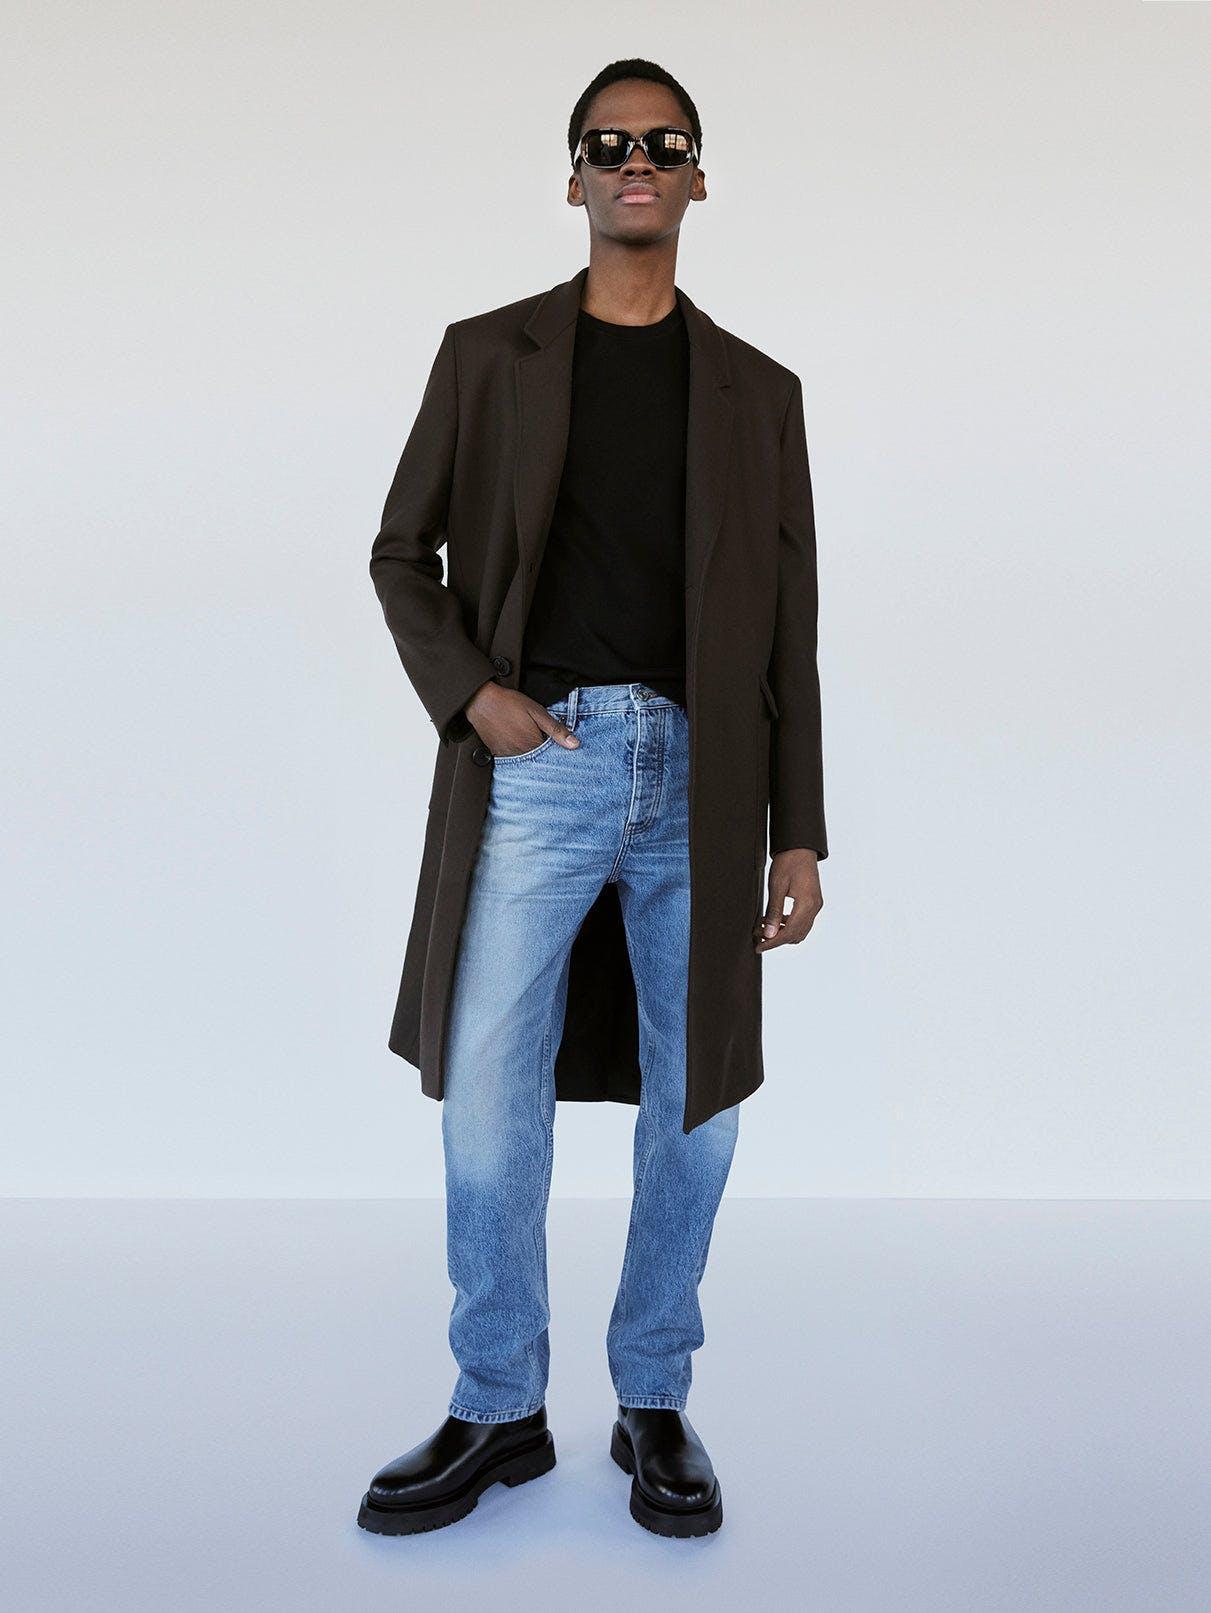 coat full body view